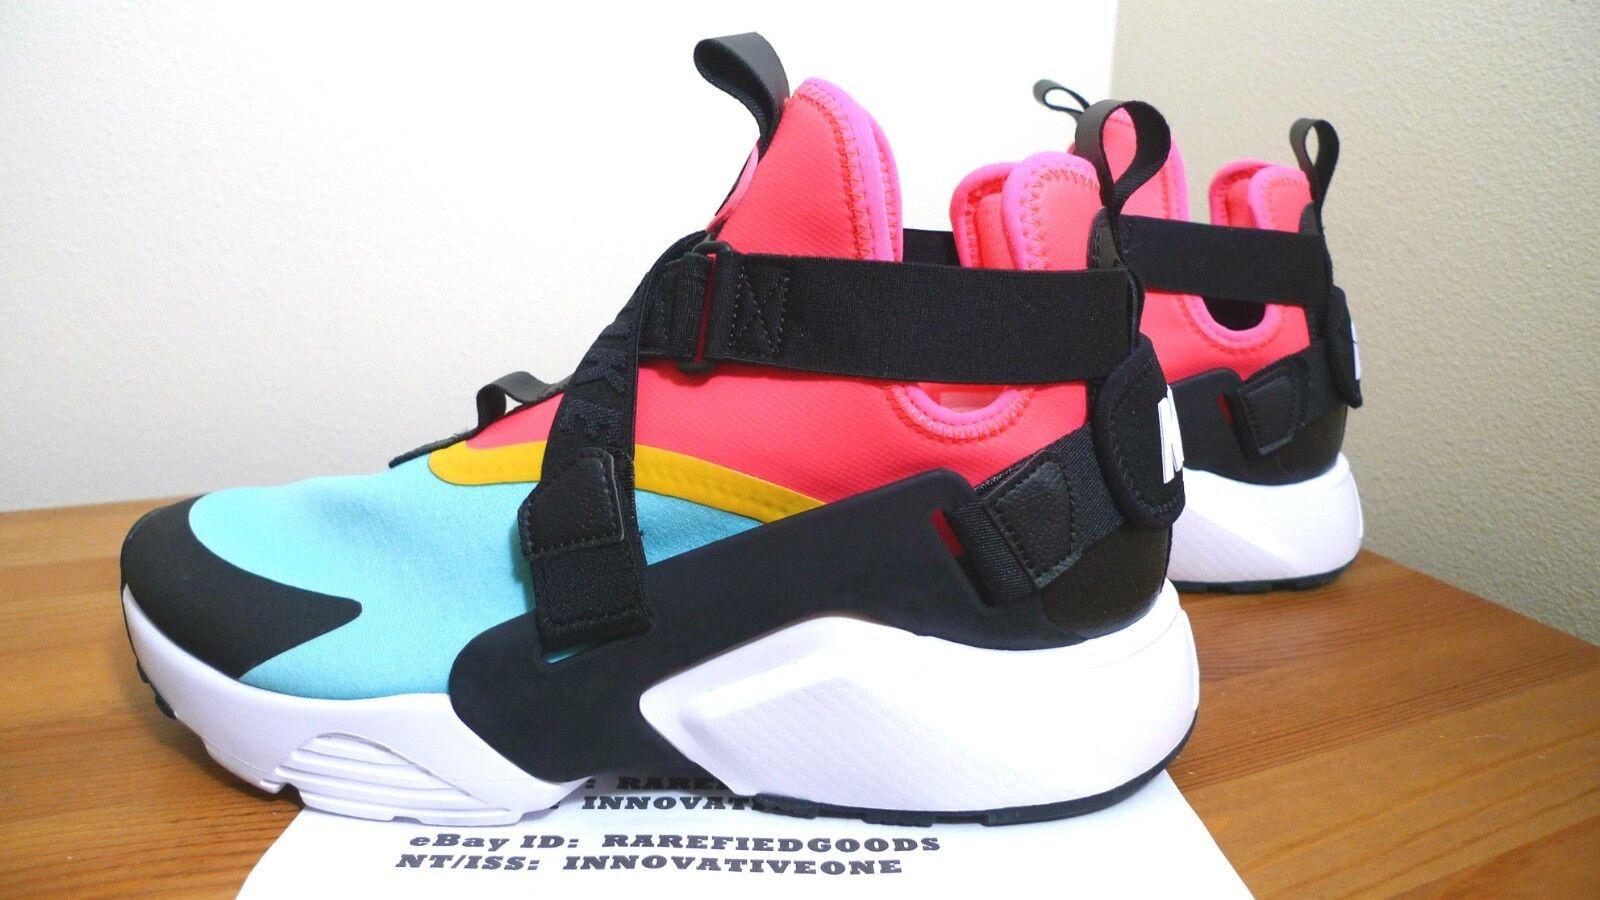 outlet store ae564 db4e9 6 Women's Nike Air Huarache City Multicolor Rainbow Casual Shoes Ah6787 400